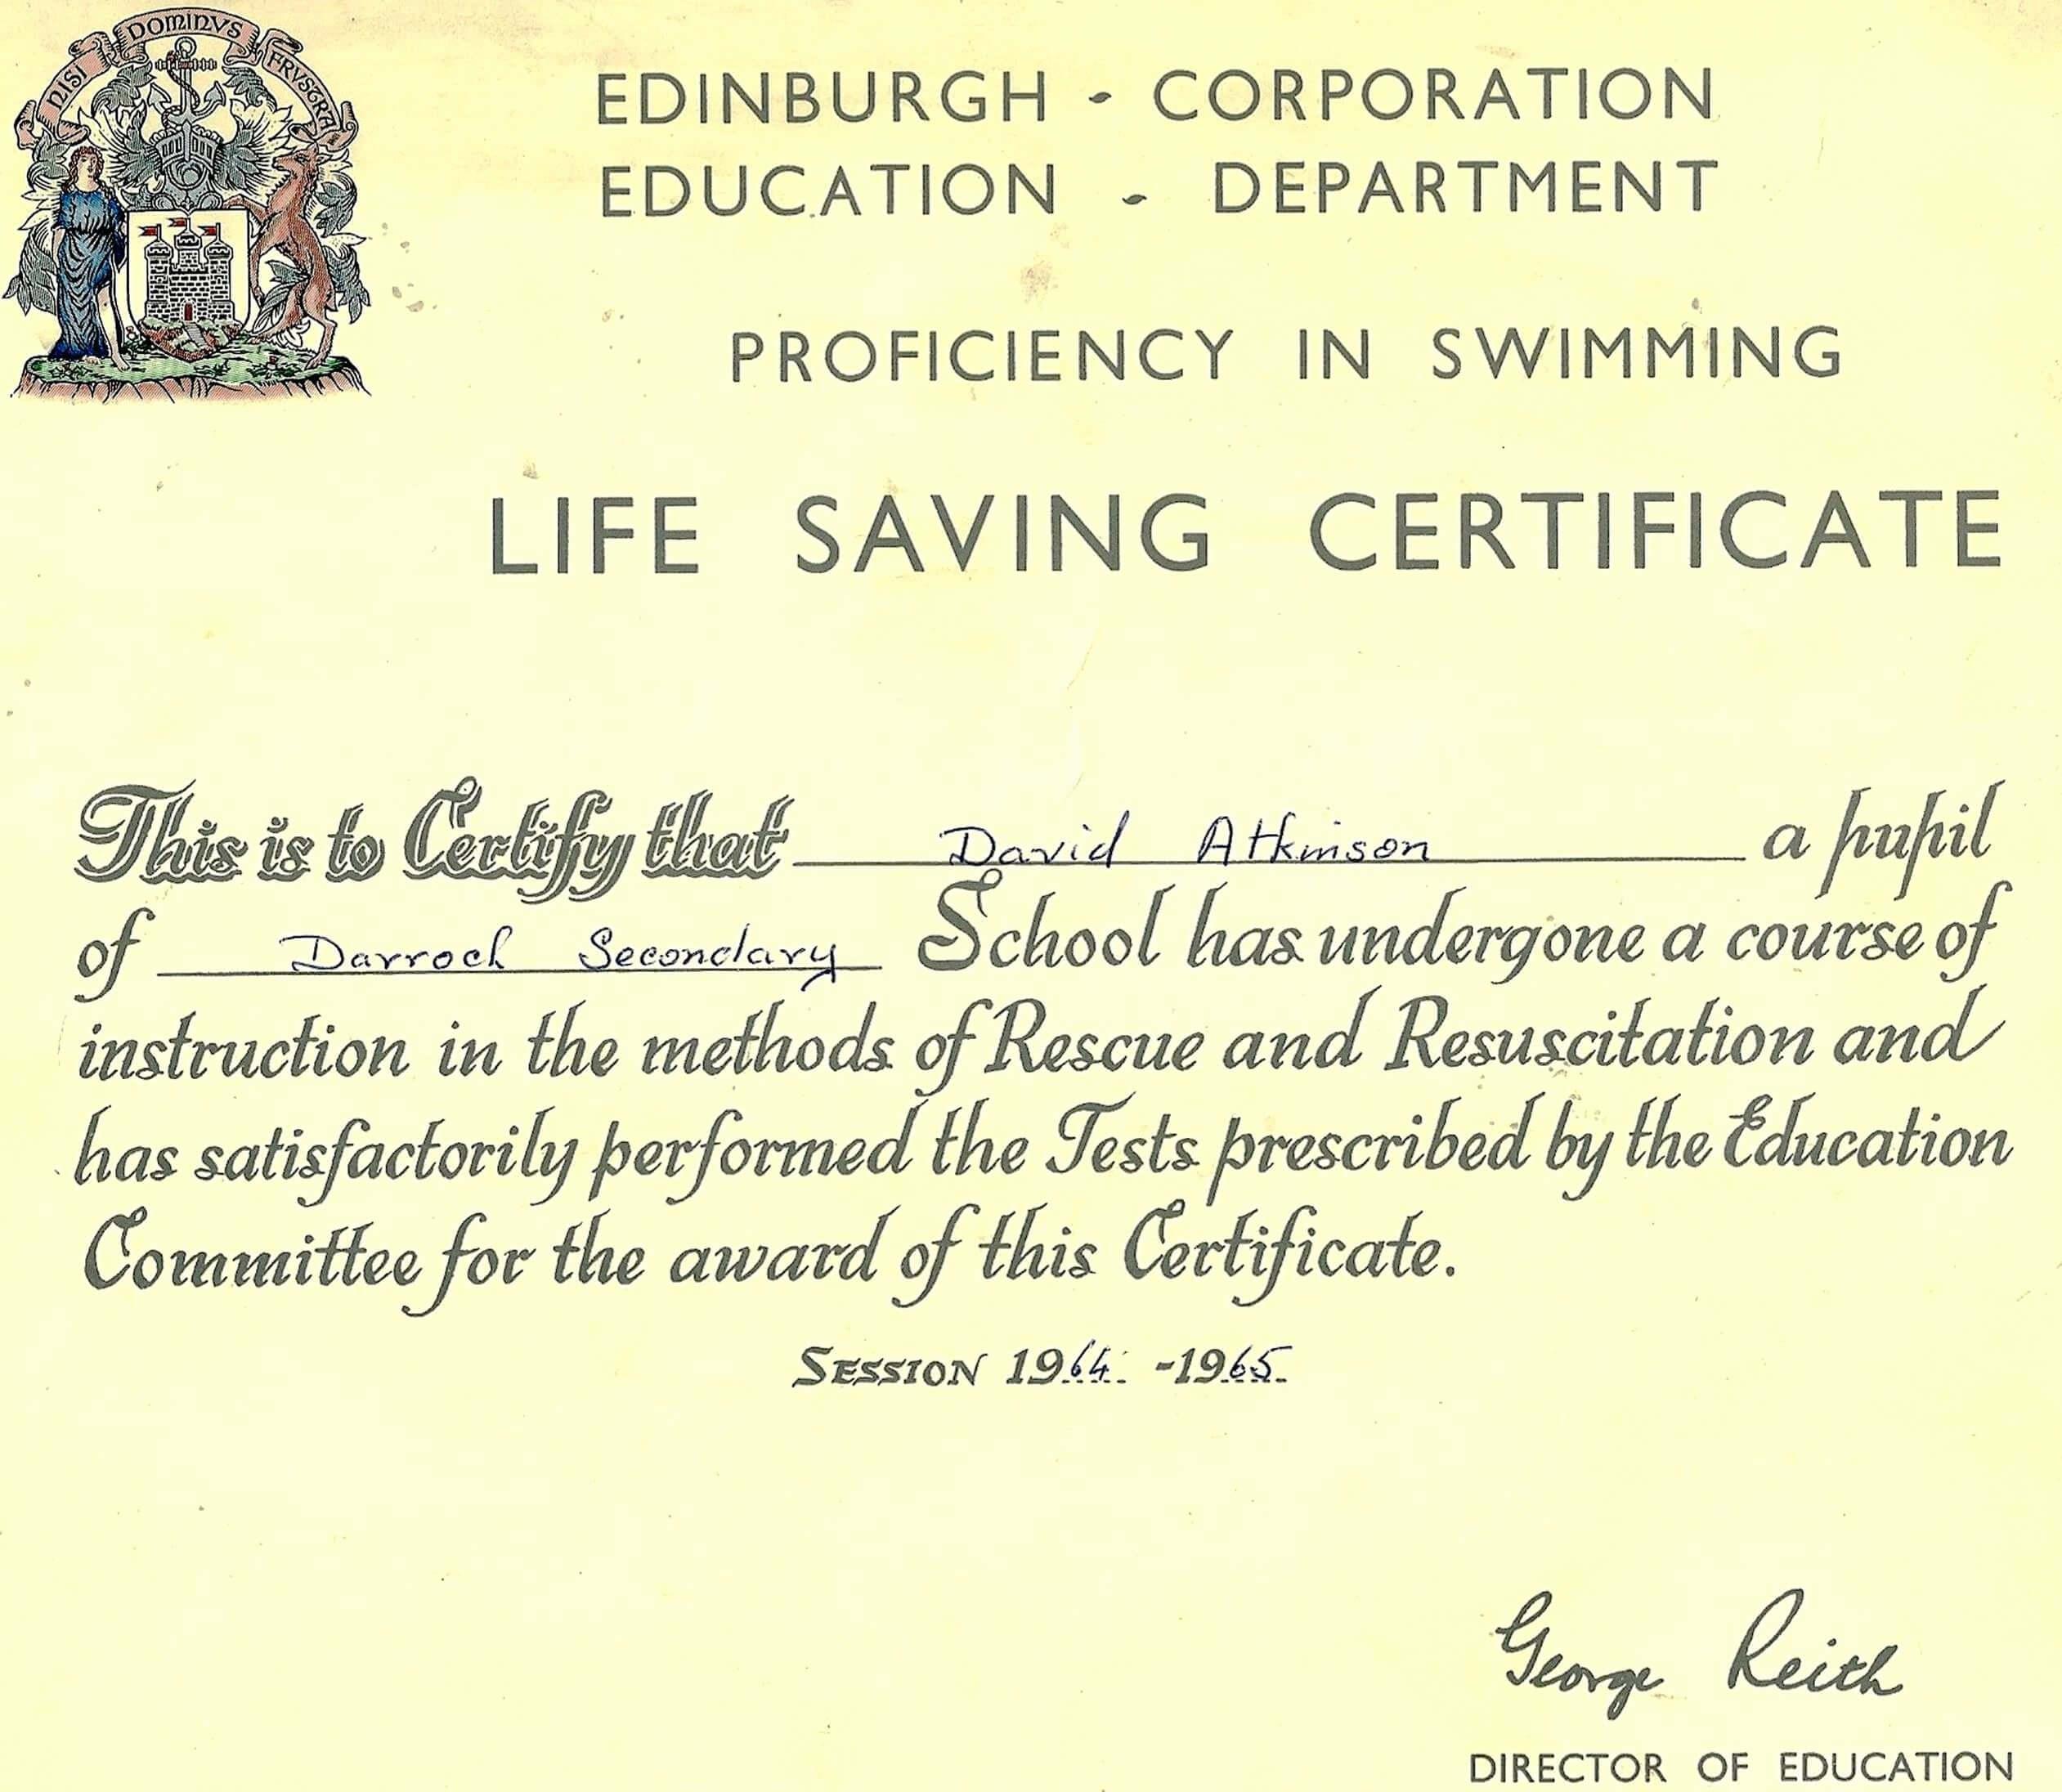 30 Life Saving Award Template | Pryncepality With Life Saving Award Certificate Template